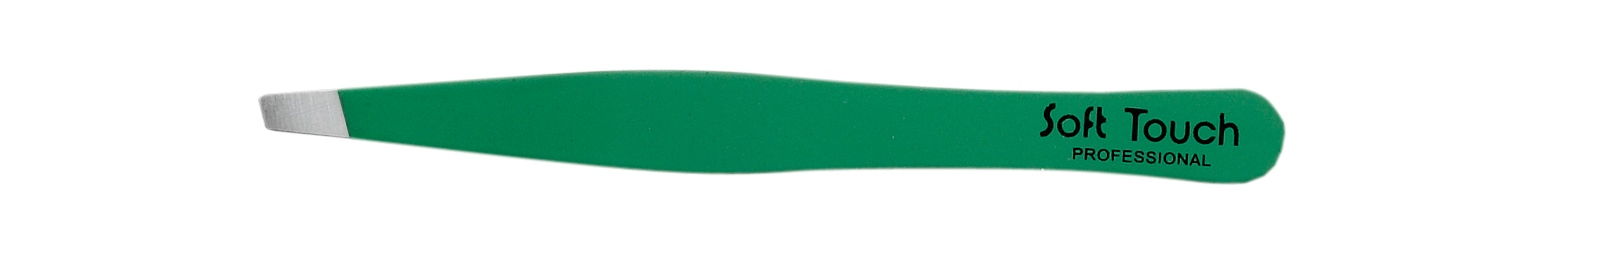 KIEPE Пинцет для бровей Soft touch зеленый